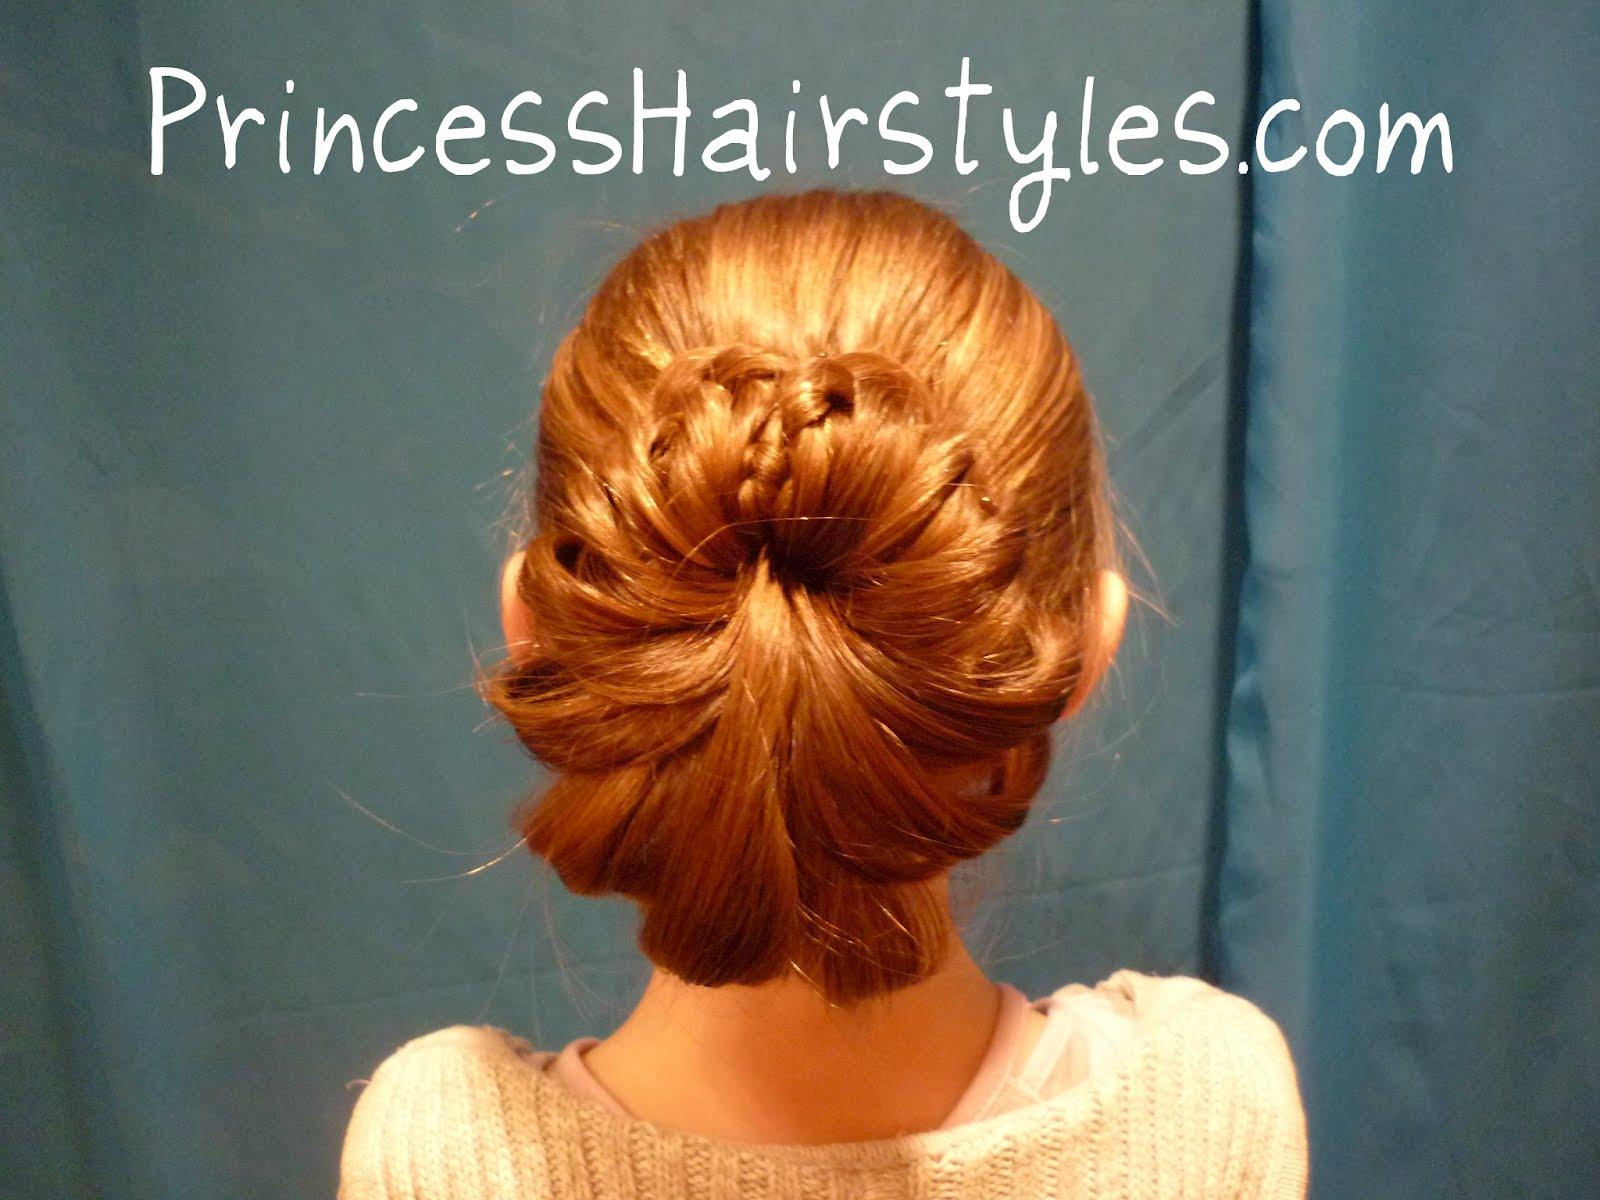 Terrific Braid Wrapped Bun Hairstyles For Girls Princess Hairstyles Short Hairstyles Gunalazisus